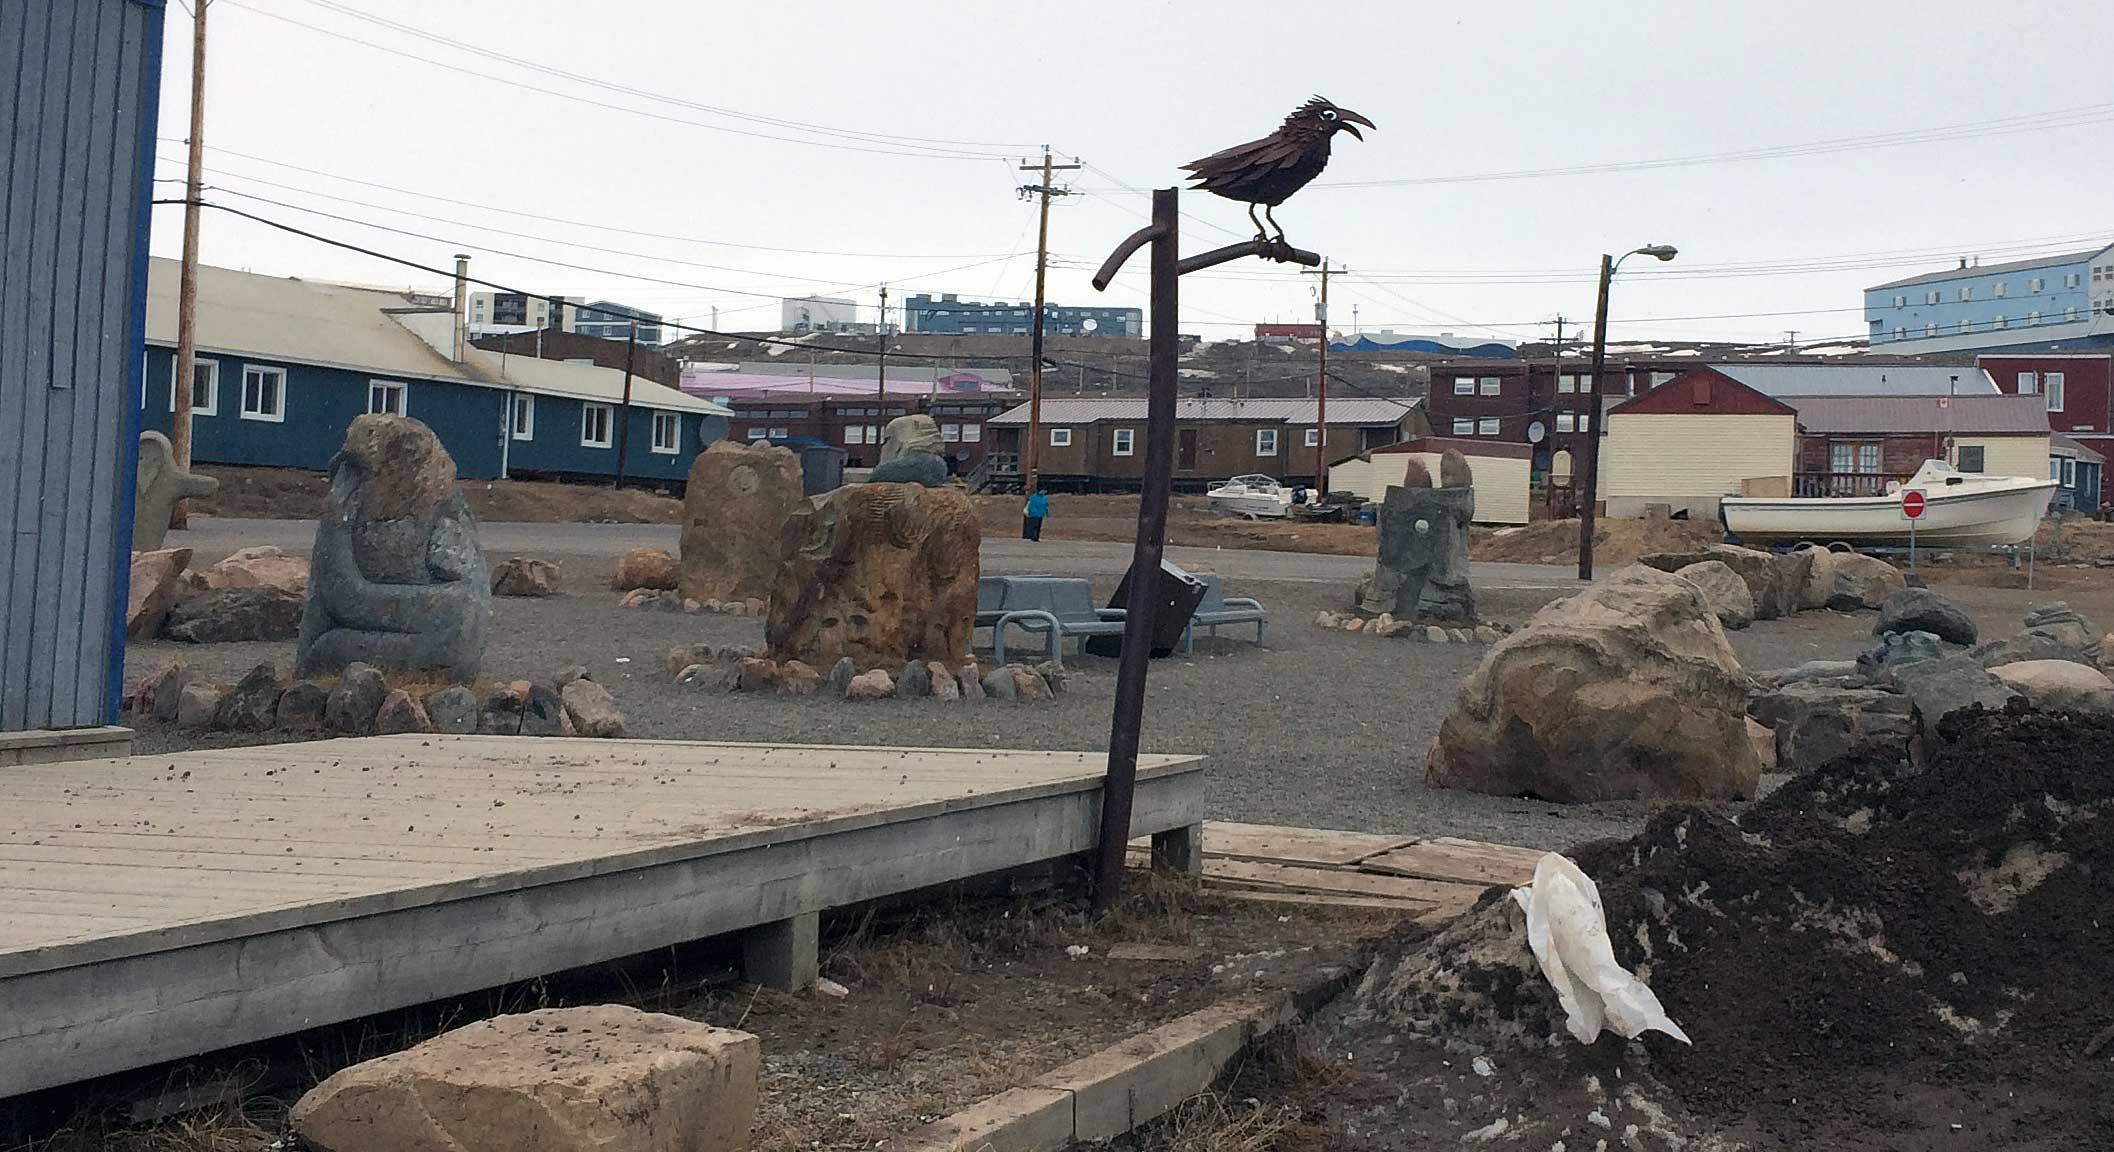 Christine-Montague-Stone-Park-iqaluit-raven_edited-1